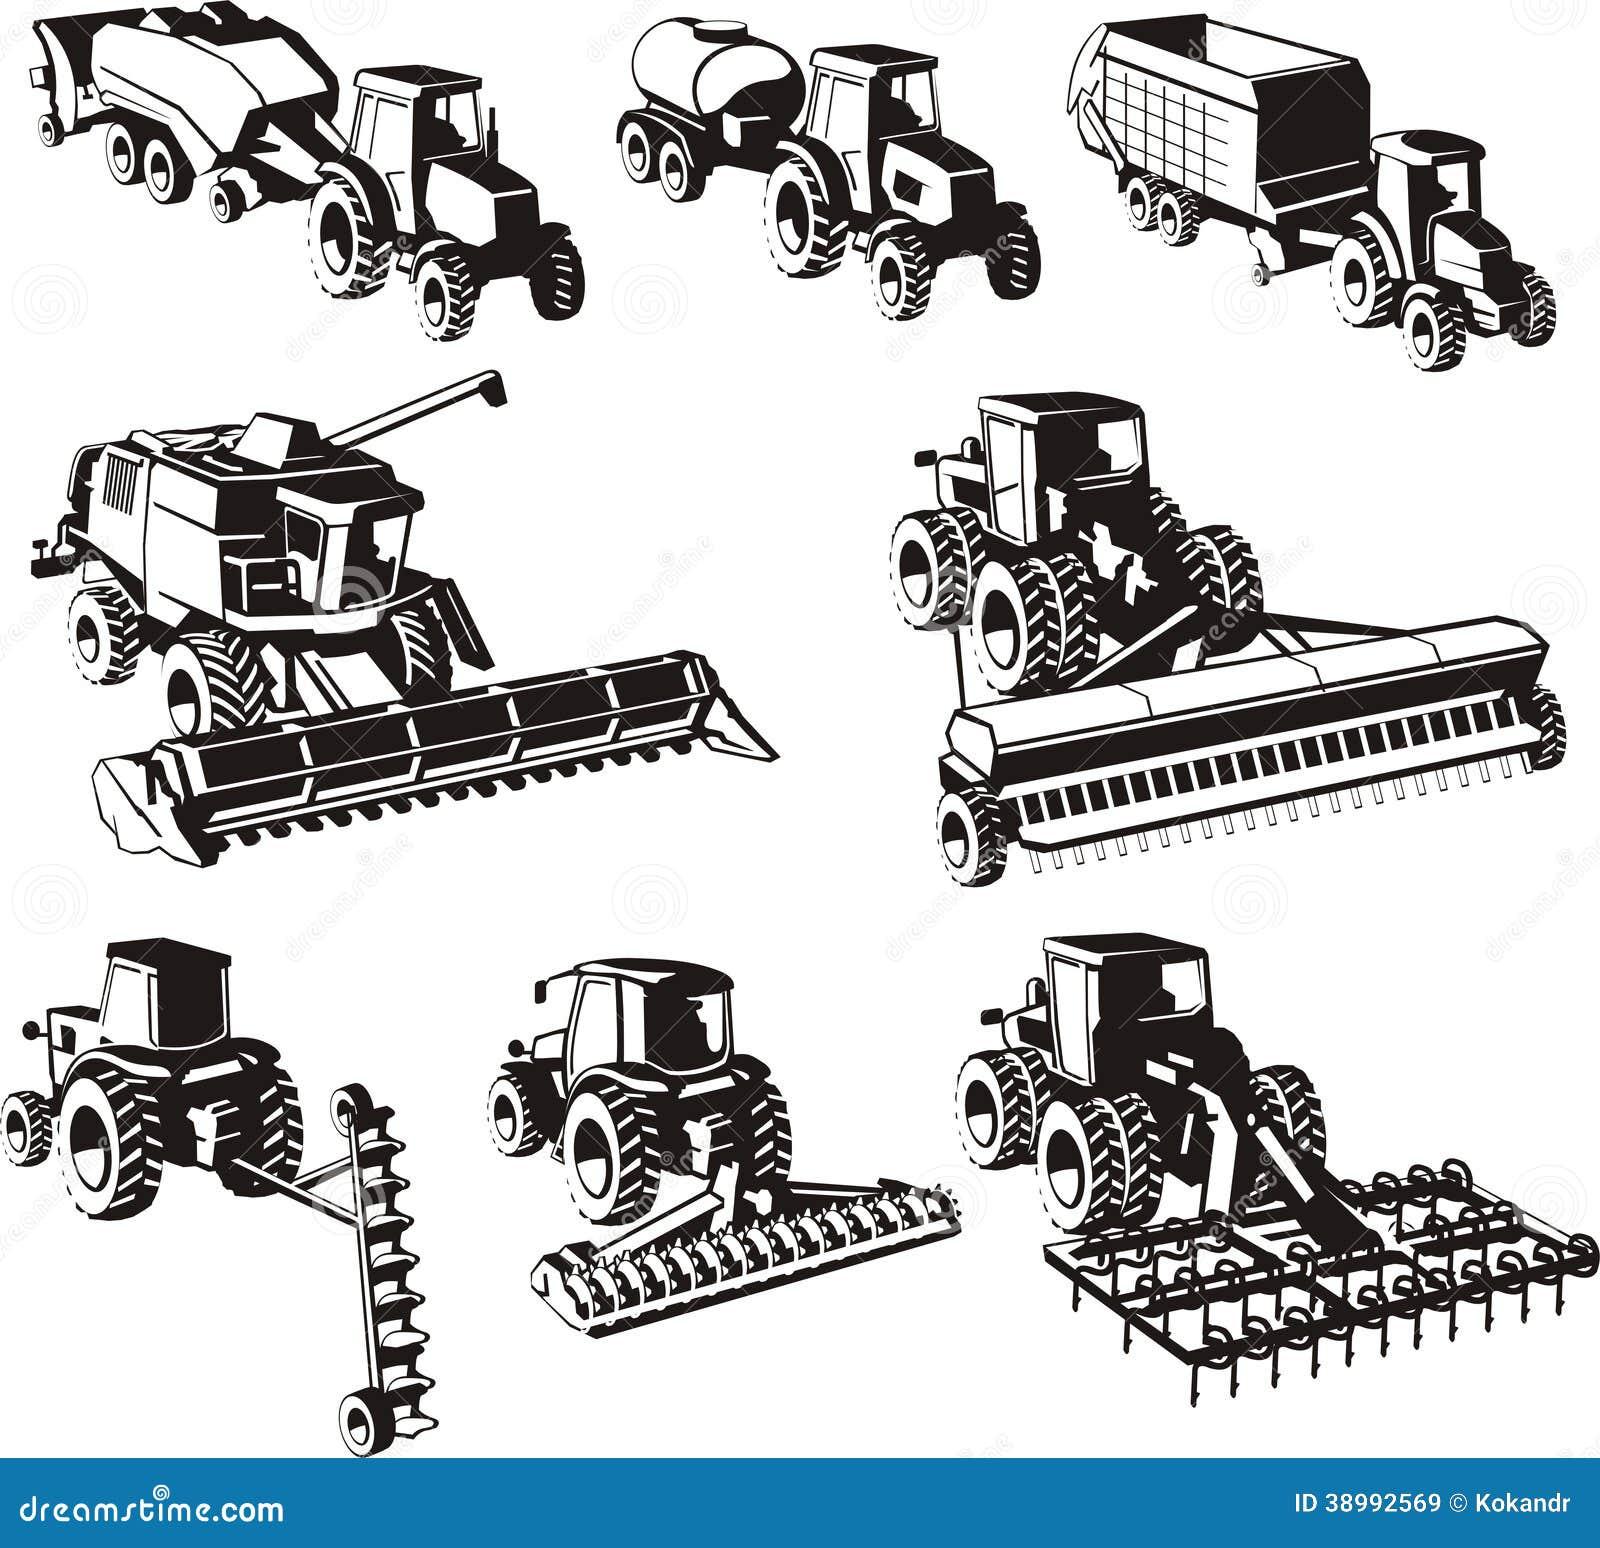 Farm Equipment Clip Art : Agriculture machines set stock vector illustration of